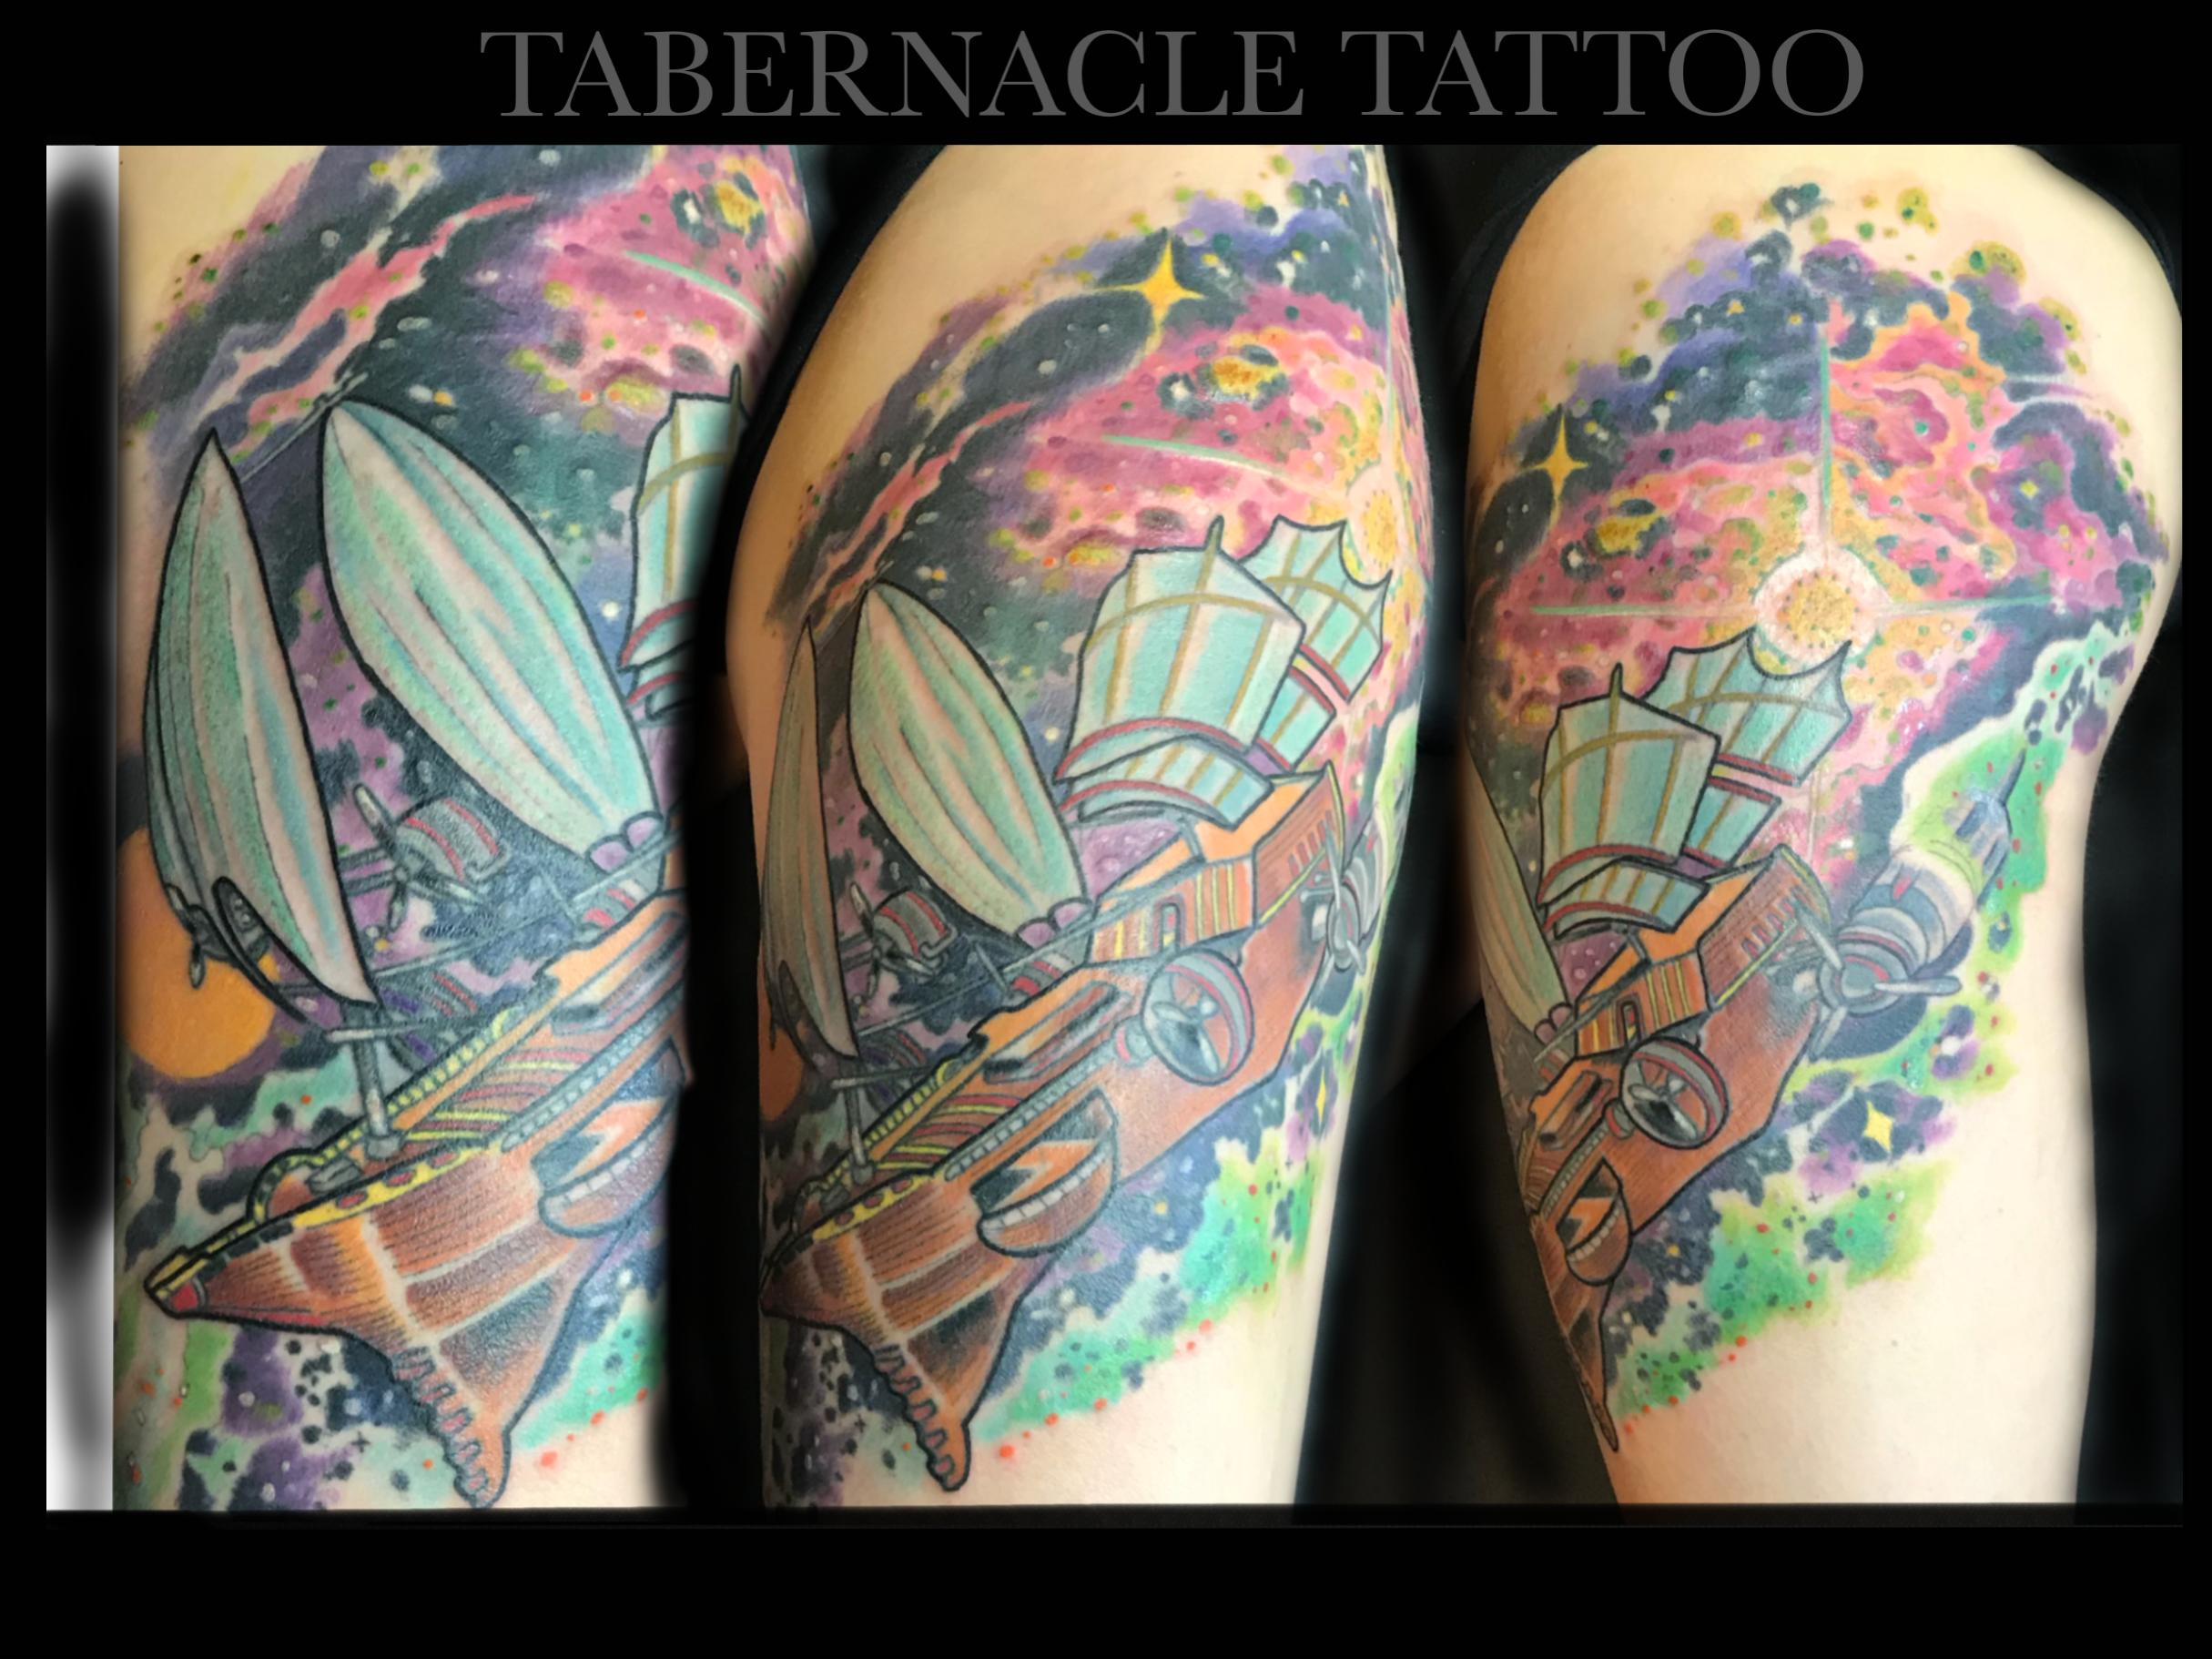 Space Ship Tattoo  Space Shuttle  Astronaut Tattoo